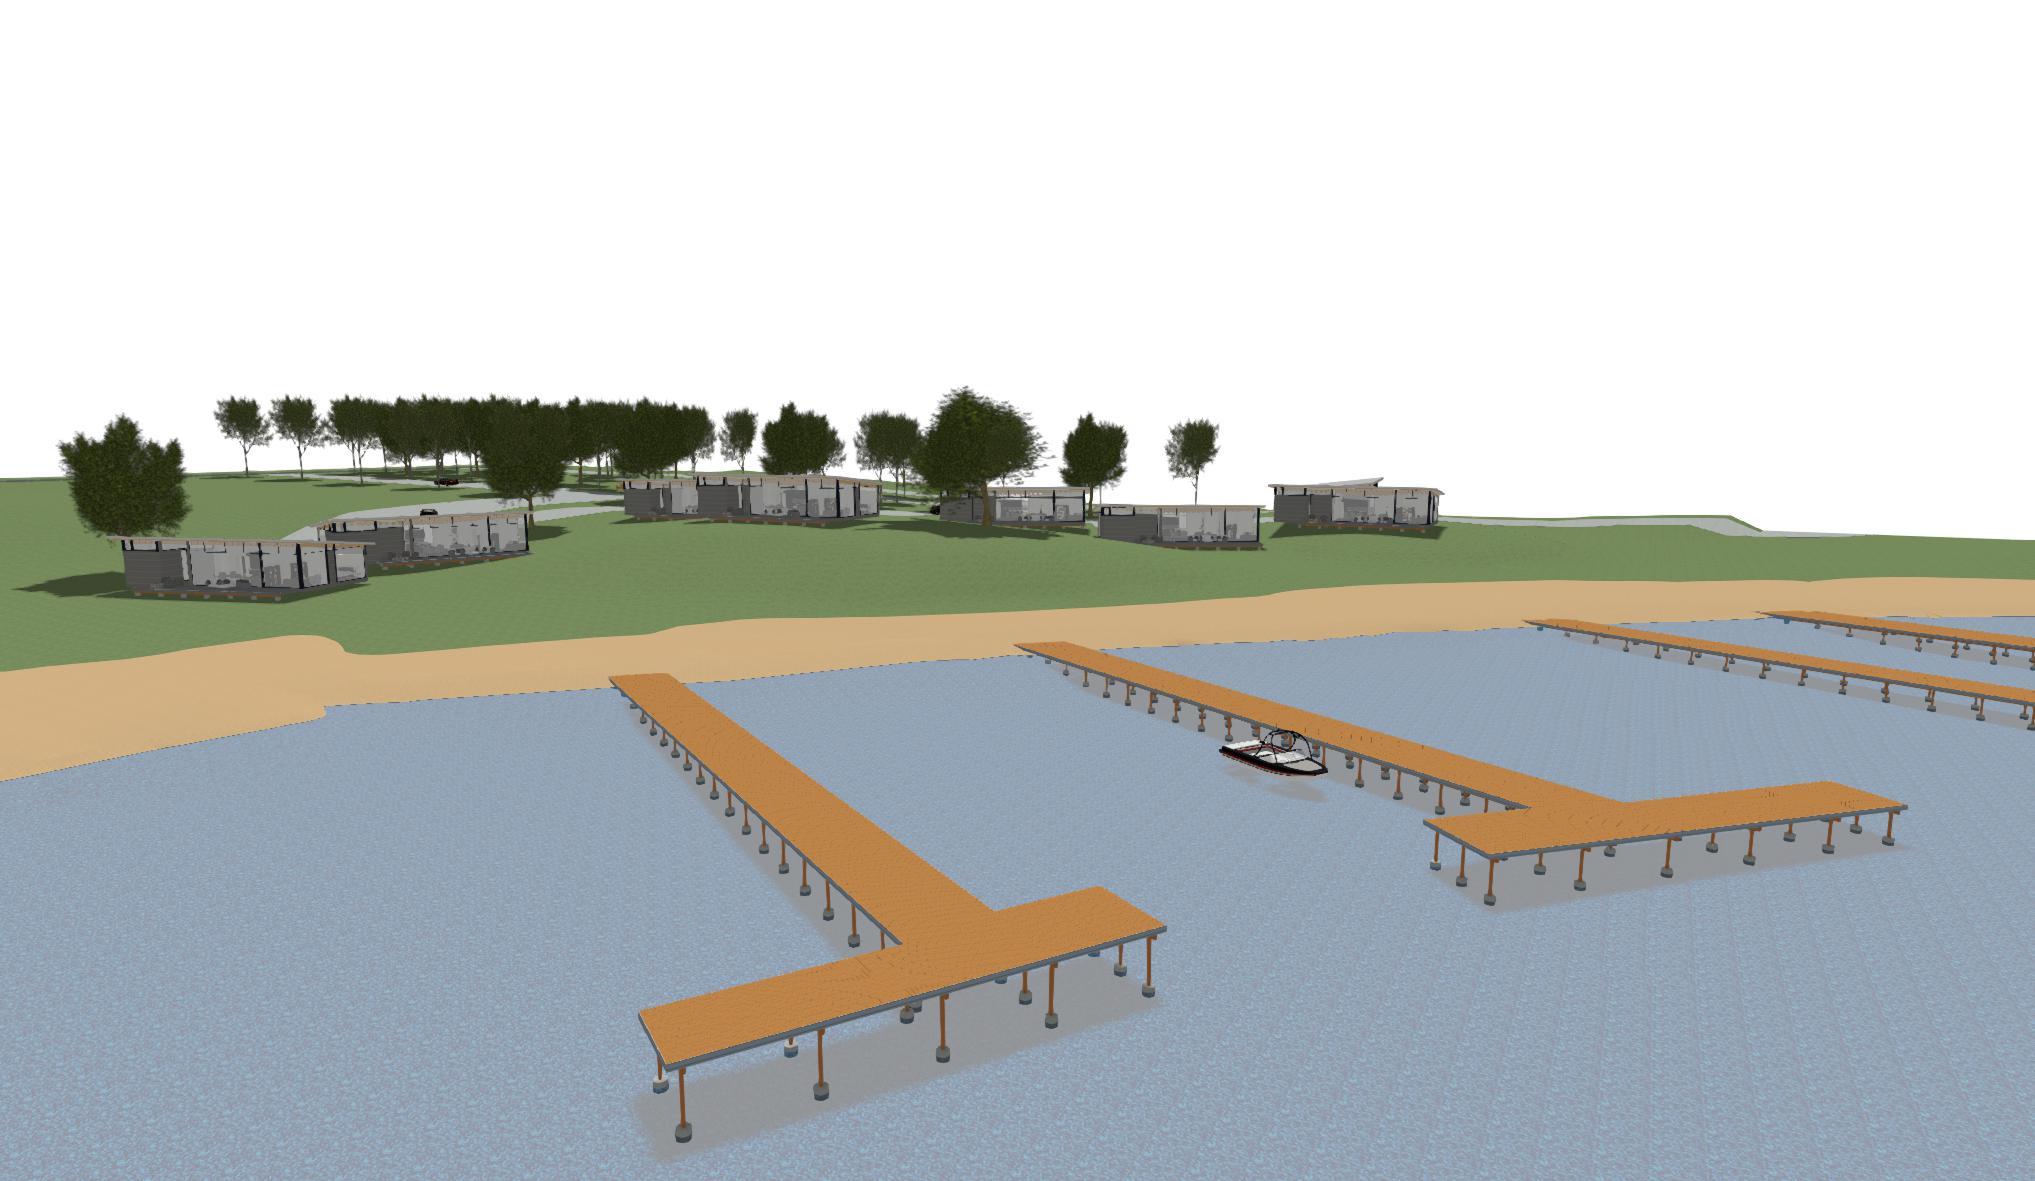 image boatyard 1.jpg